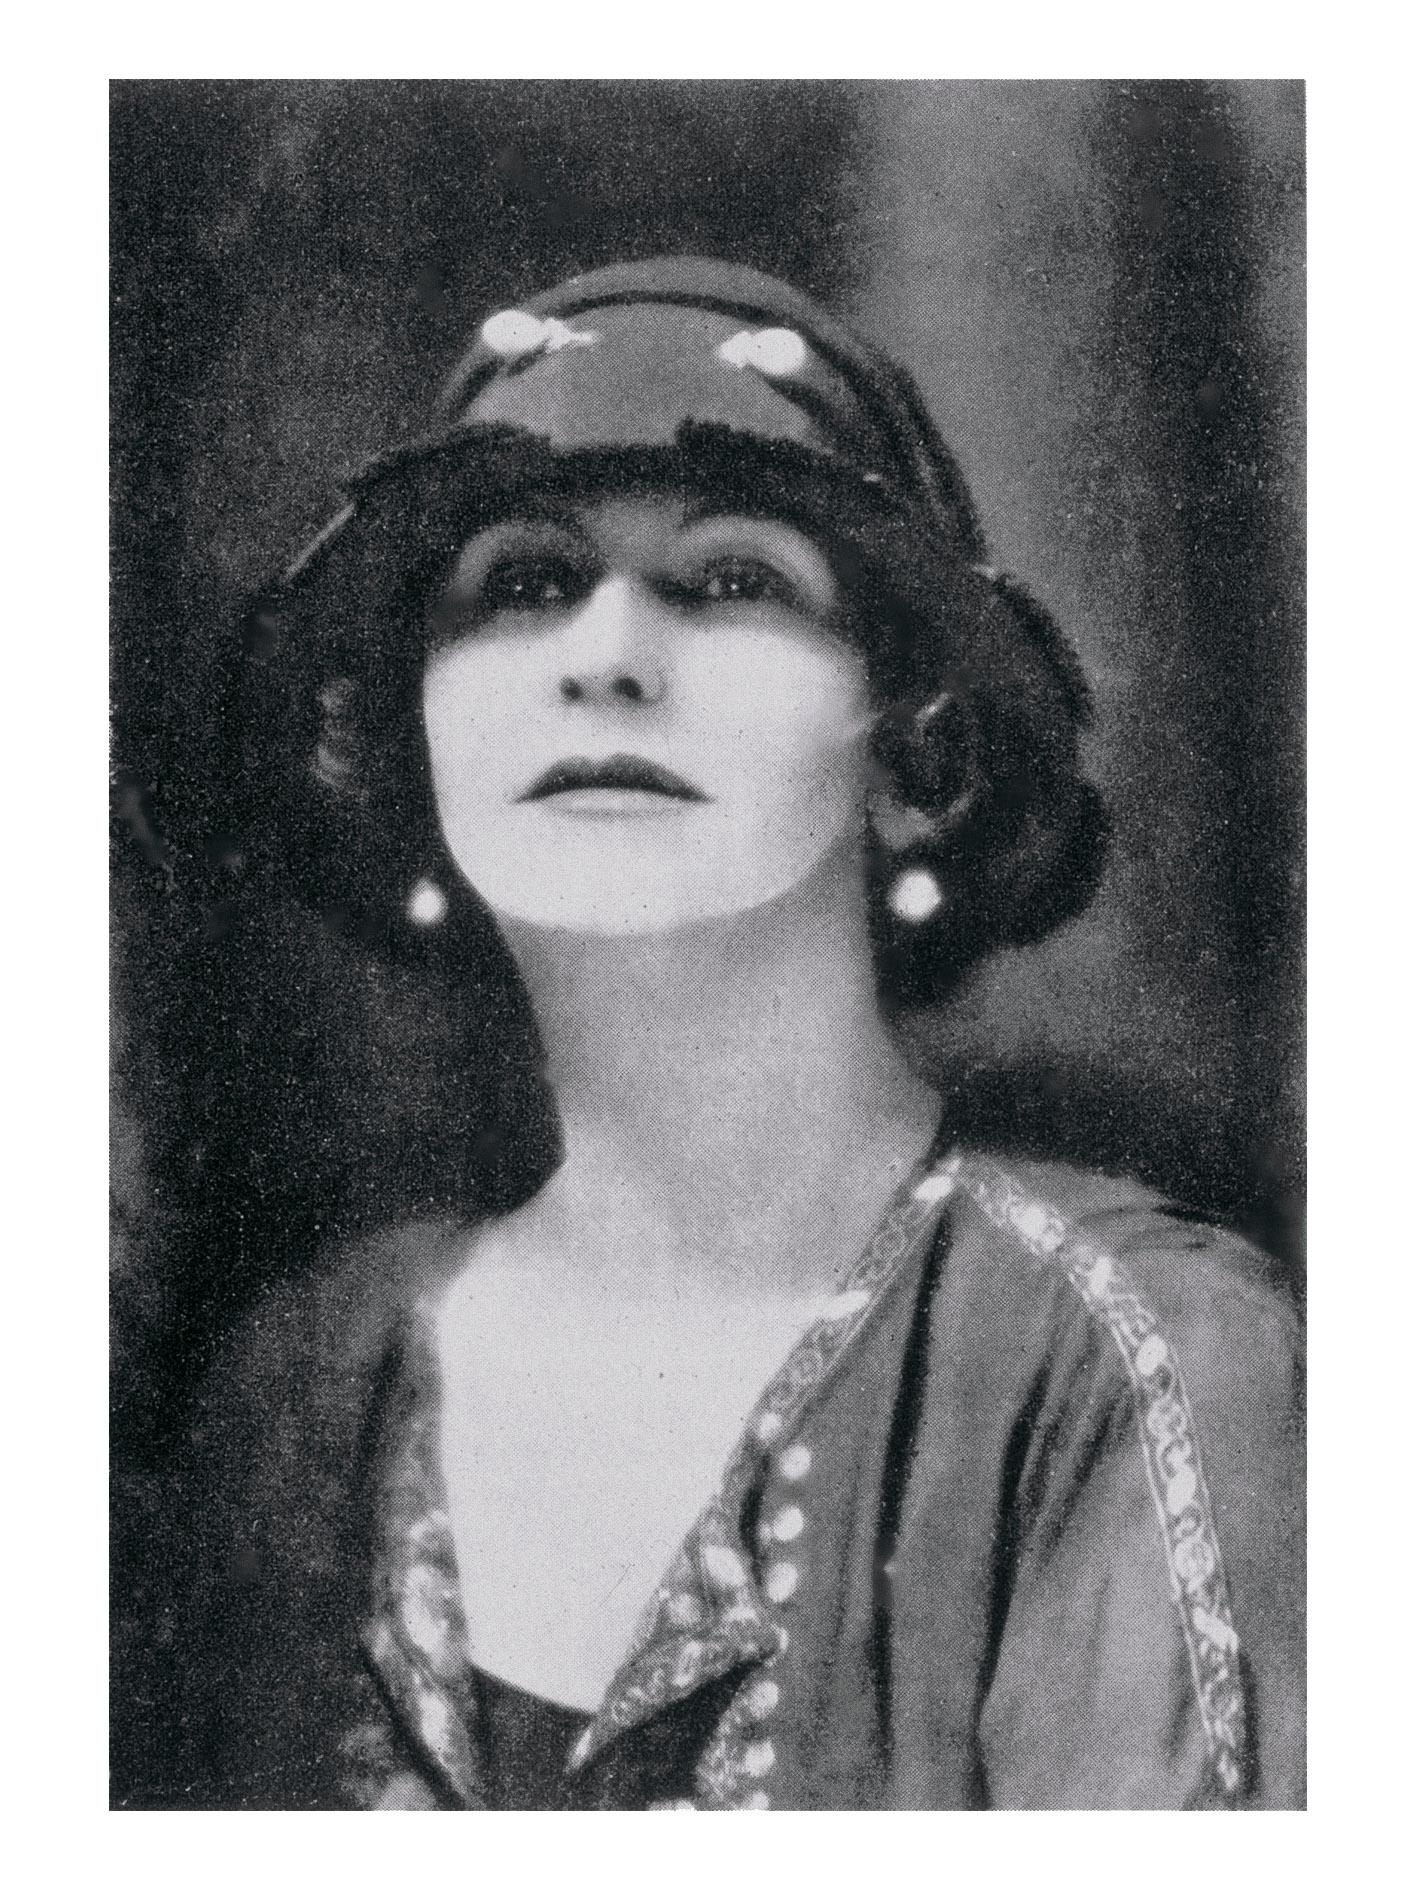 1923 Gabrielle Chanel Russian shirt Esprit de Gabrielle espritdegabrielle.com